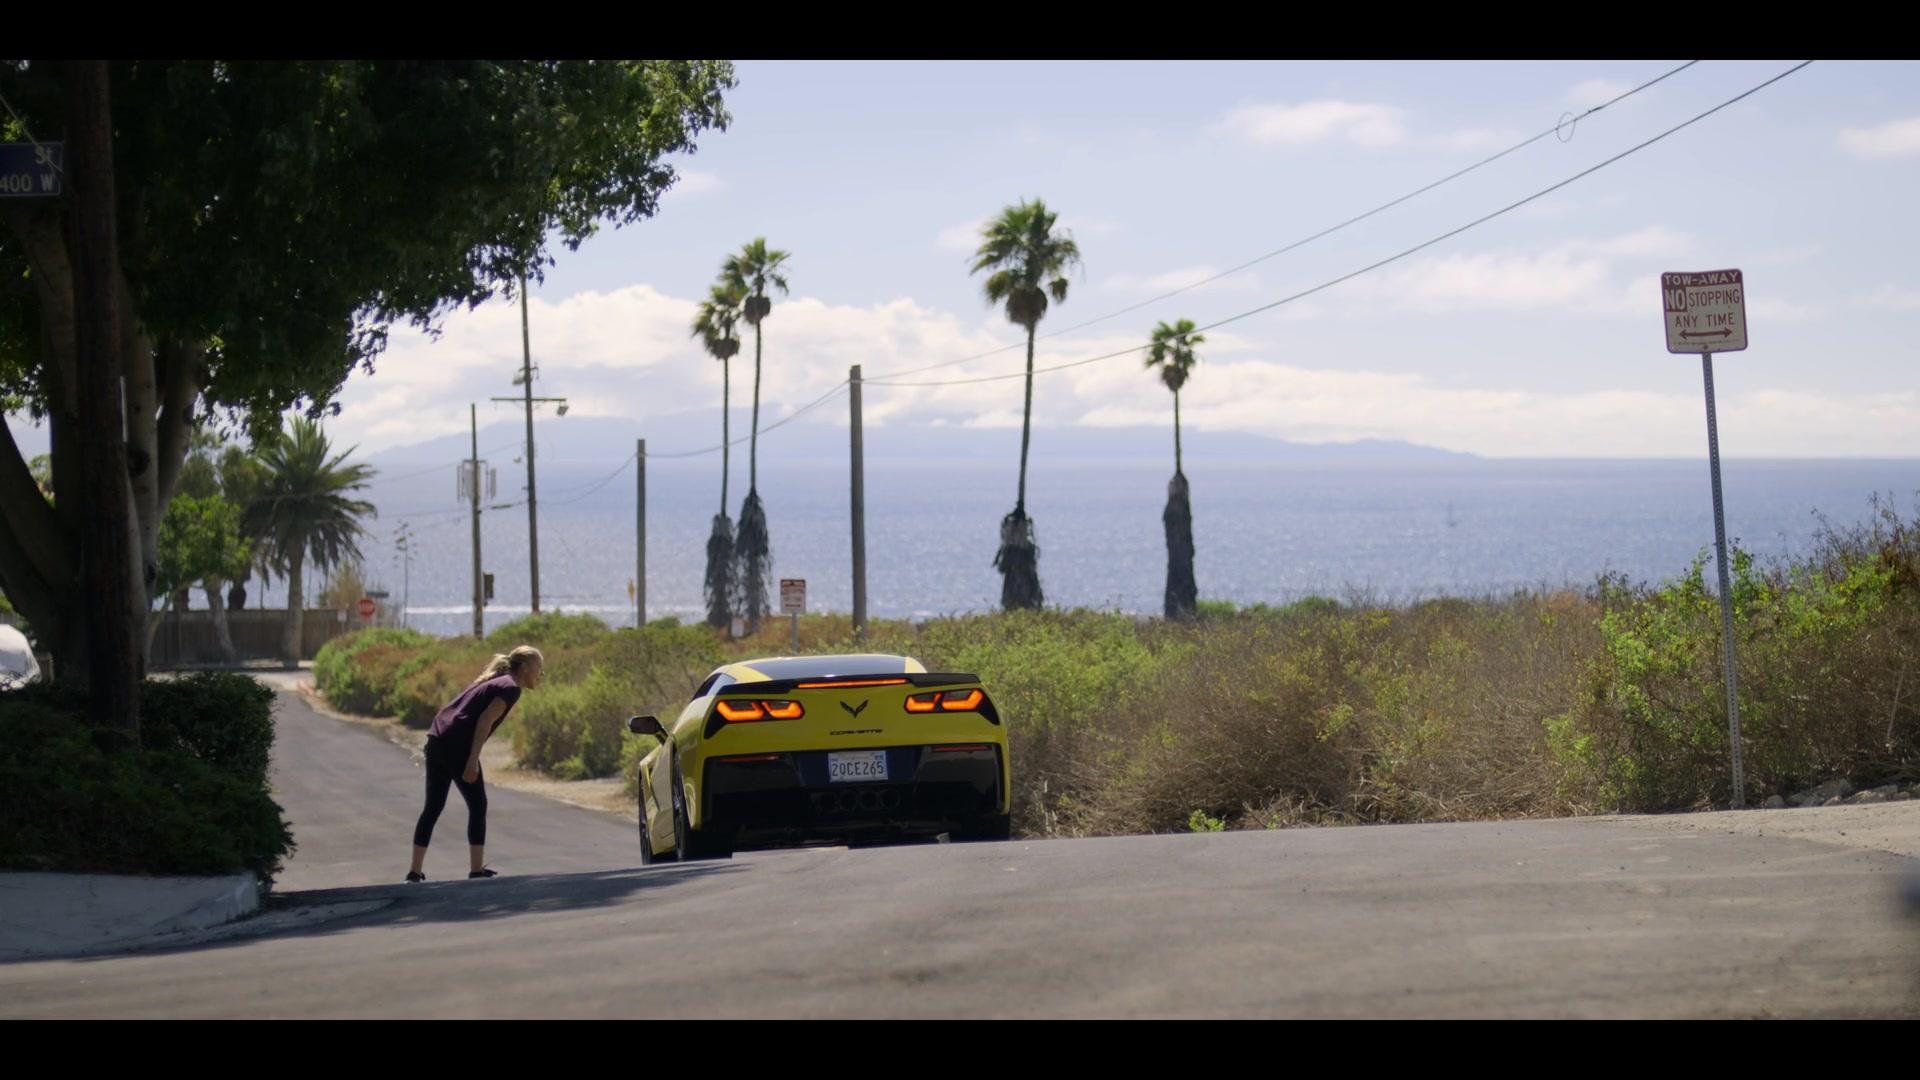 Corvette Stingray Yellow Sports Car in Dead to Me - Season 1